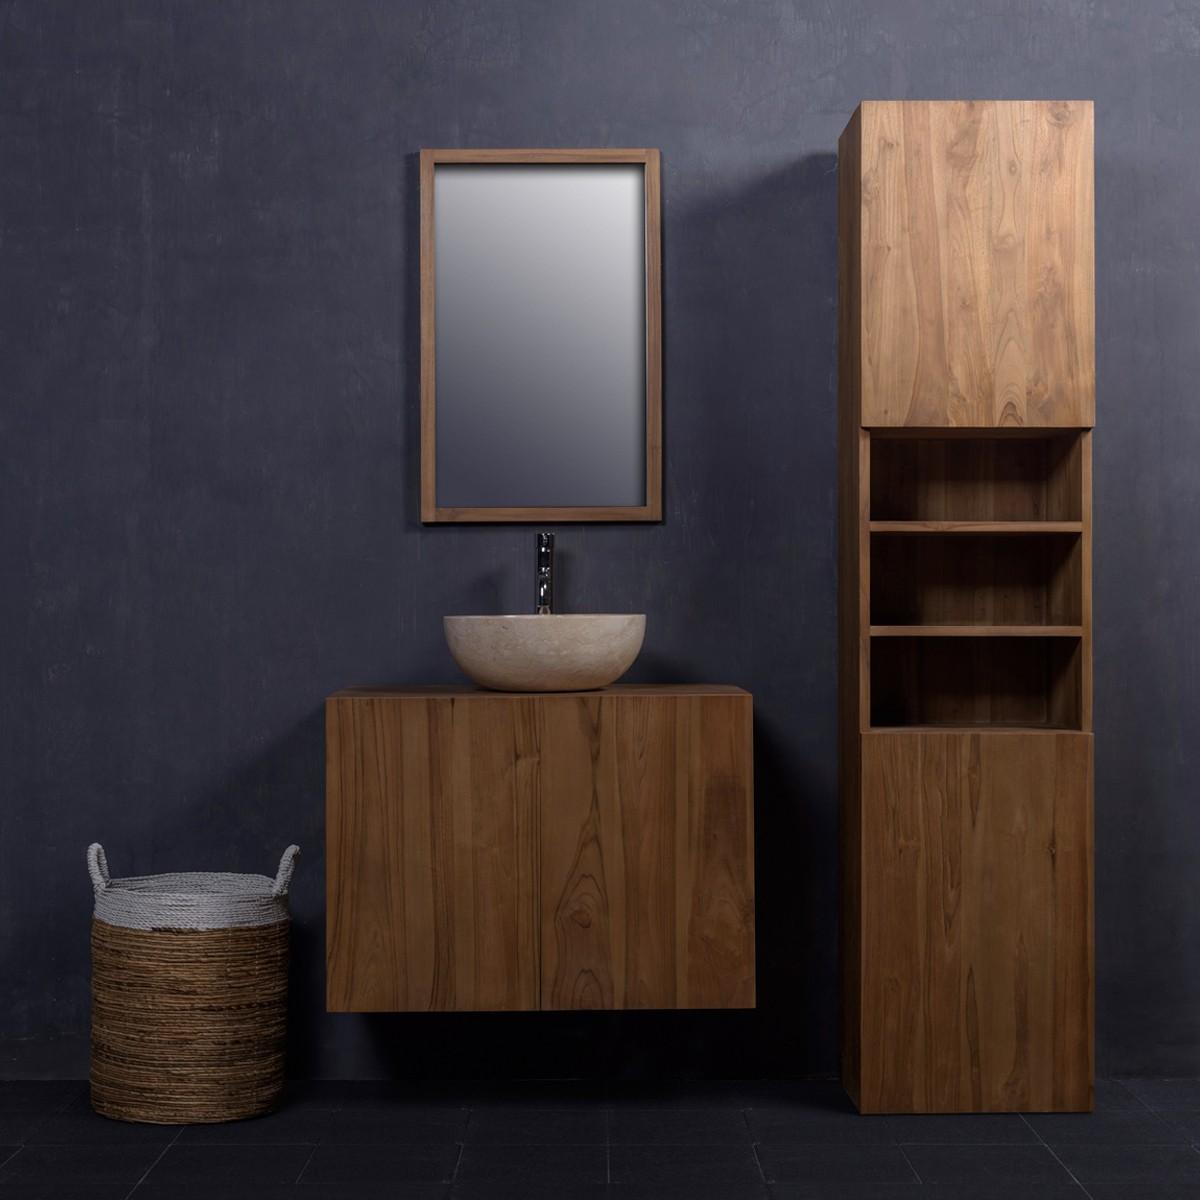 Stunning miroir teck salle de bain images awesome for Miroir 90x70 bois